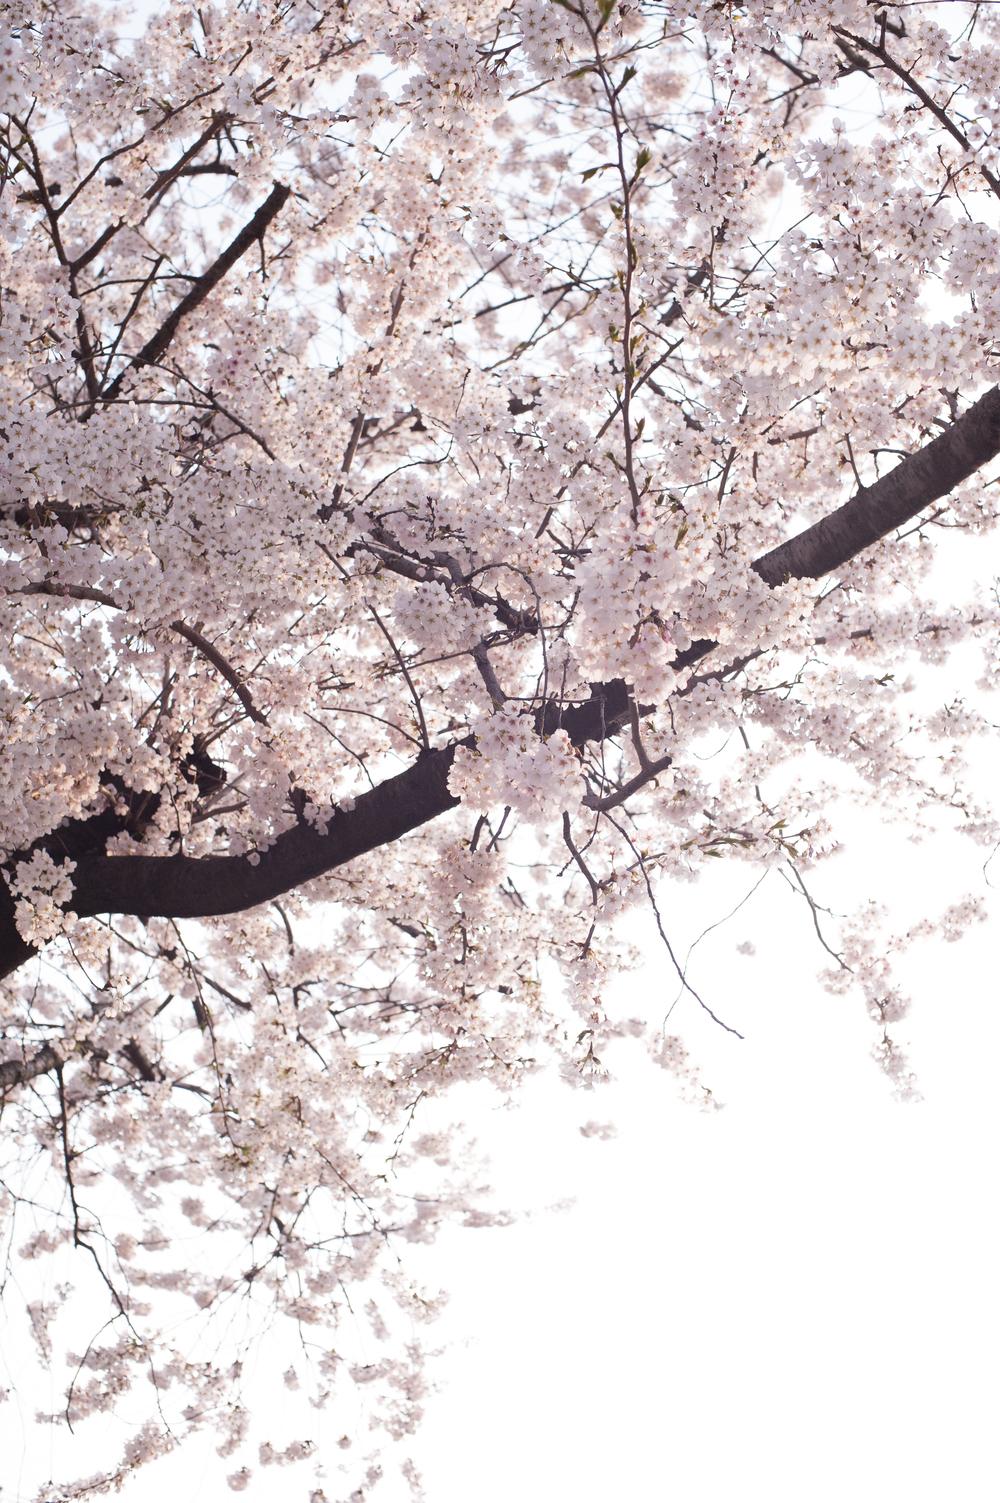 CherryBlossomsSouthKorea (1 of 5).jpg